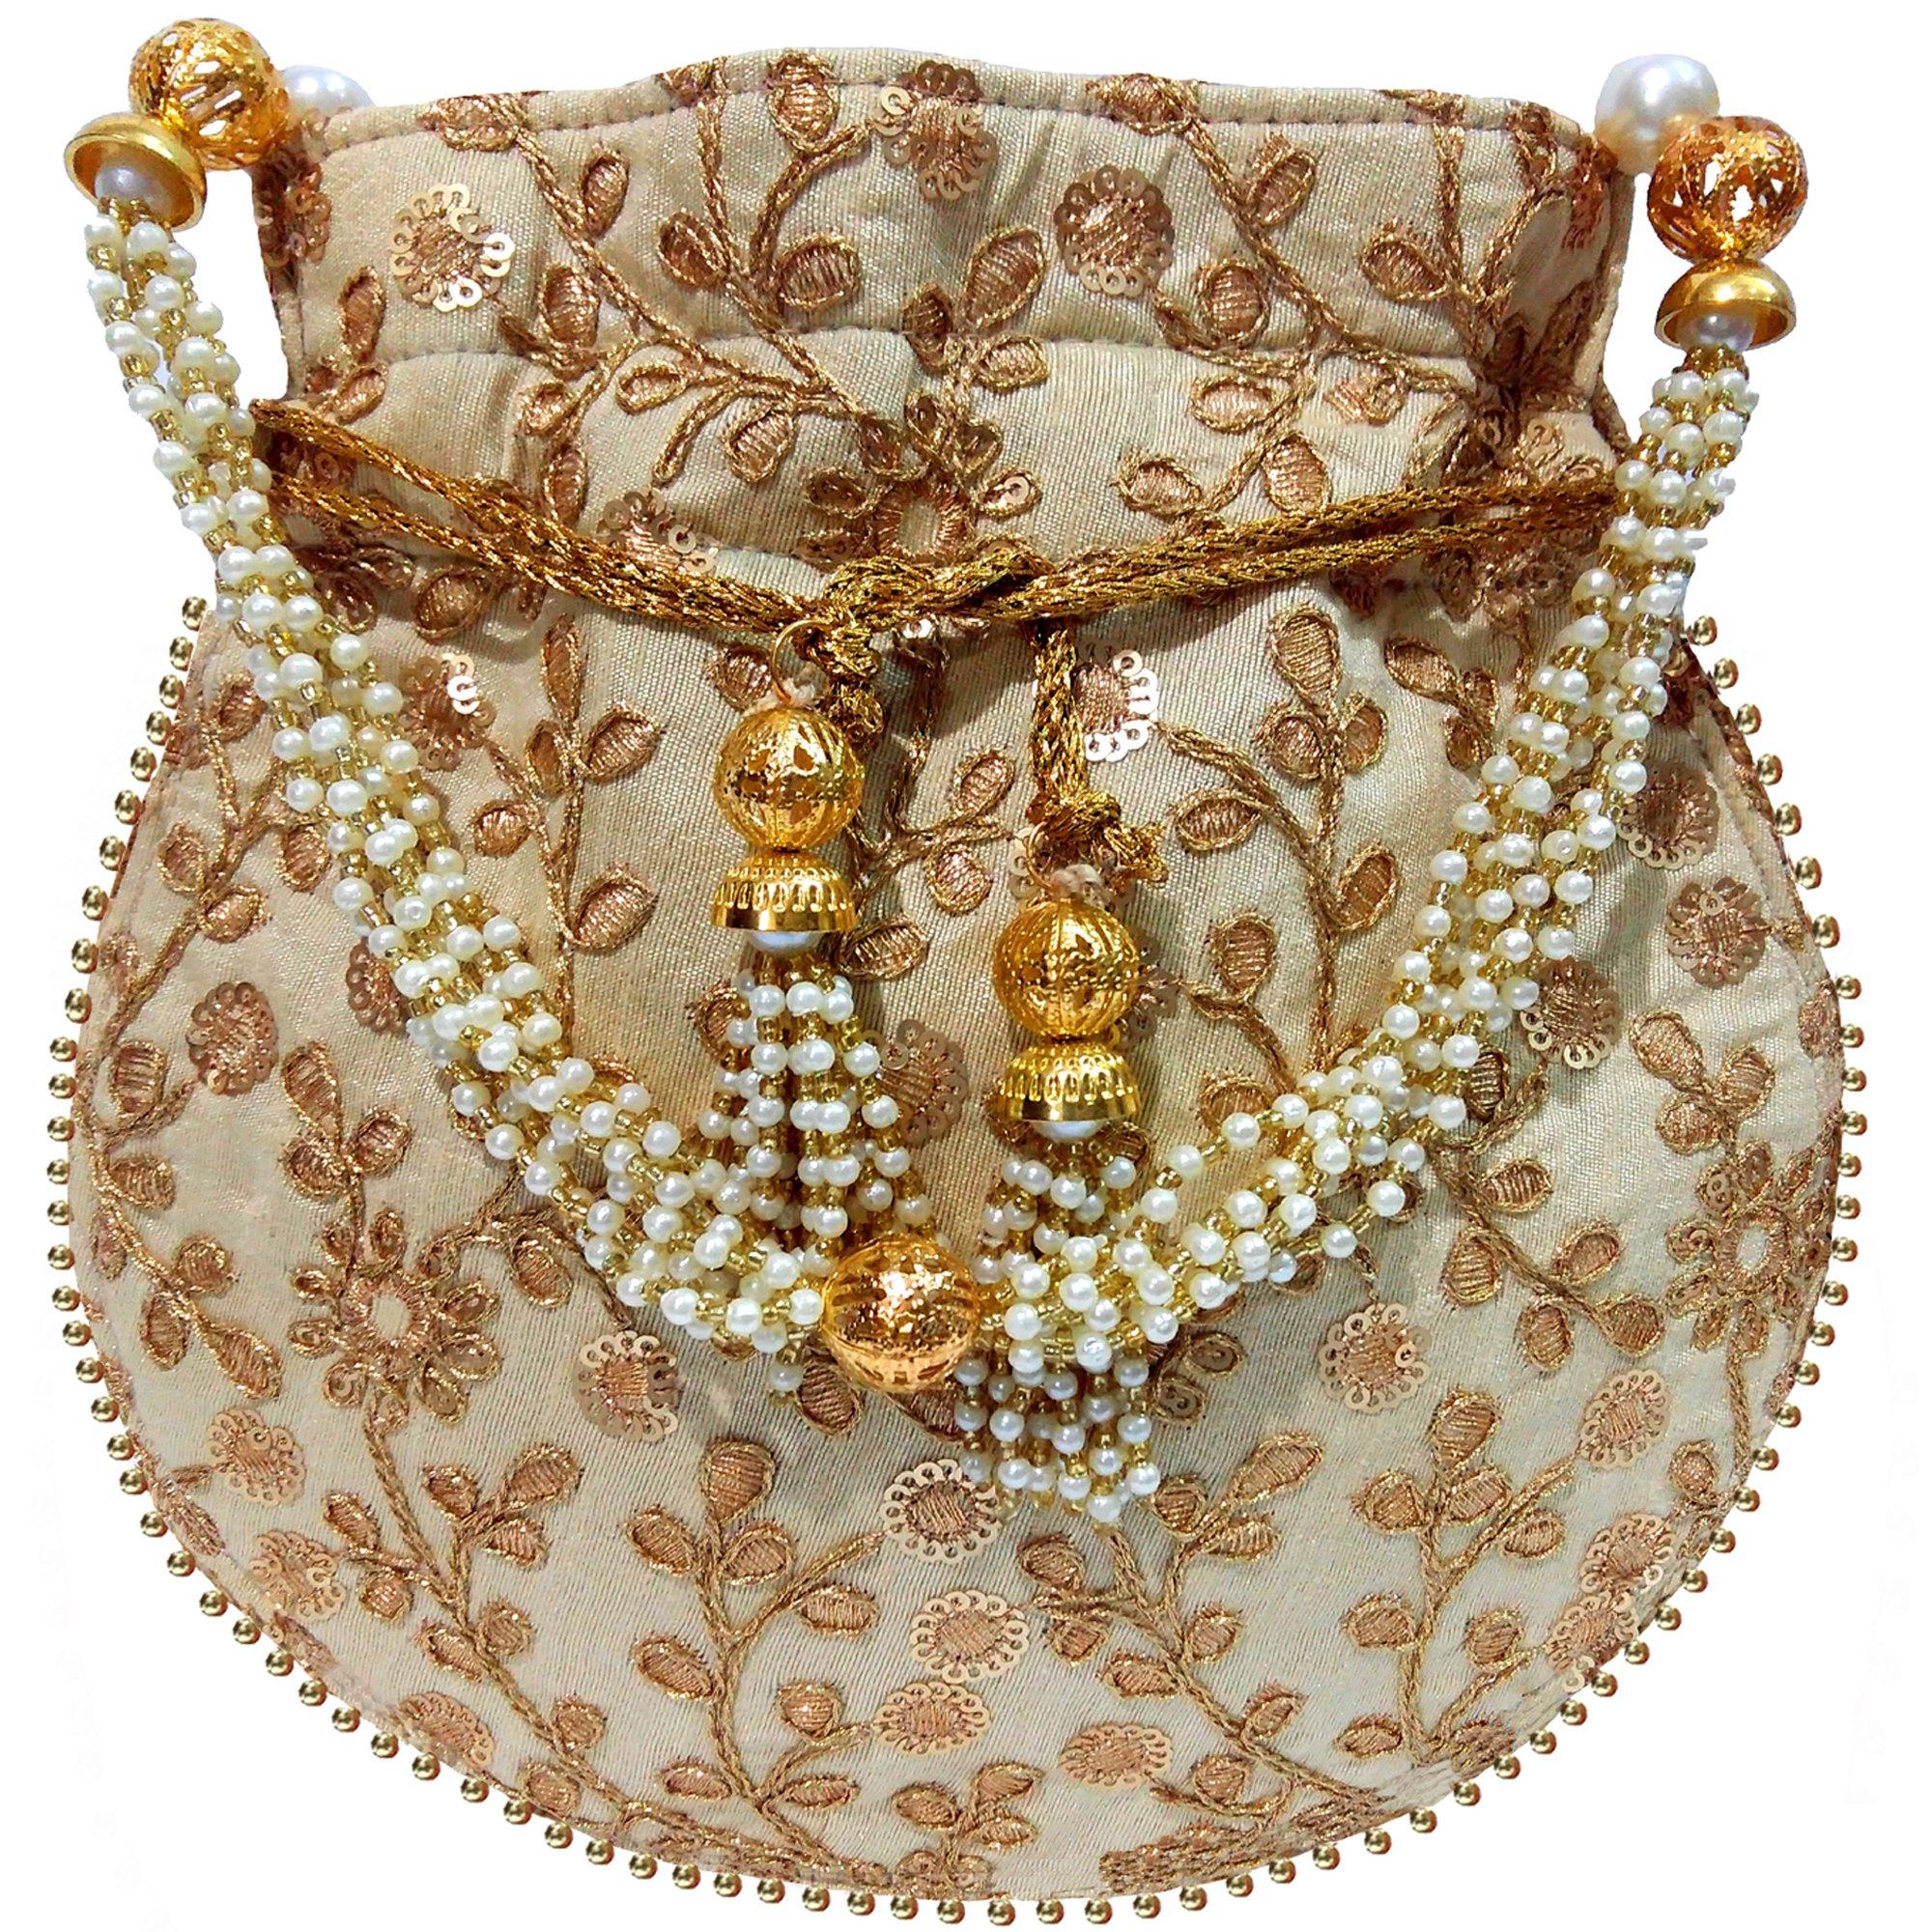 Wedding Women Purse Party Designer Bridal Clutch/Jewelry Pouch/Indian Evening Potli Handbag (10 x 8 x 1.75 inches, Lavish Beige)